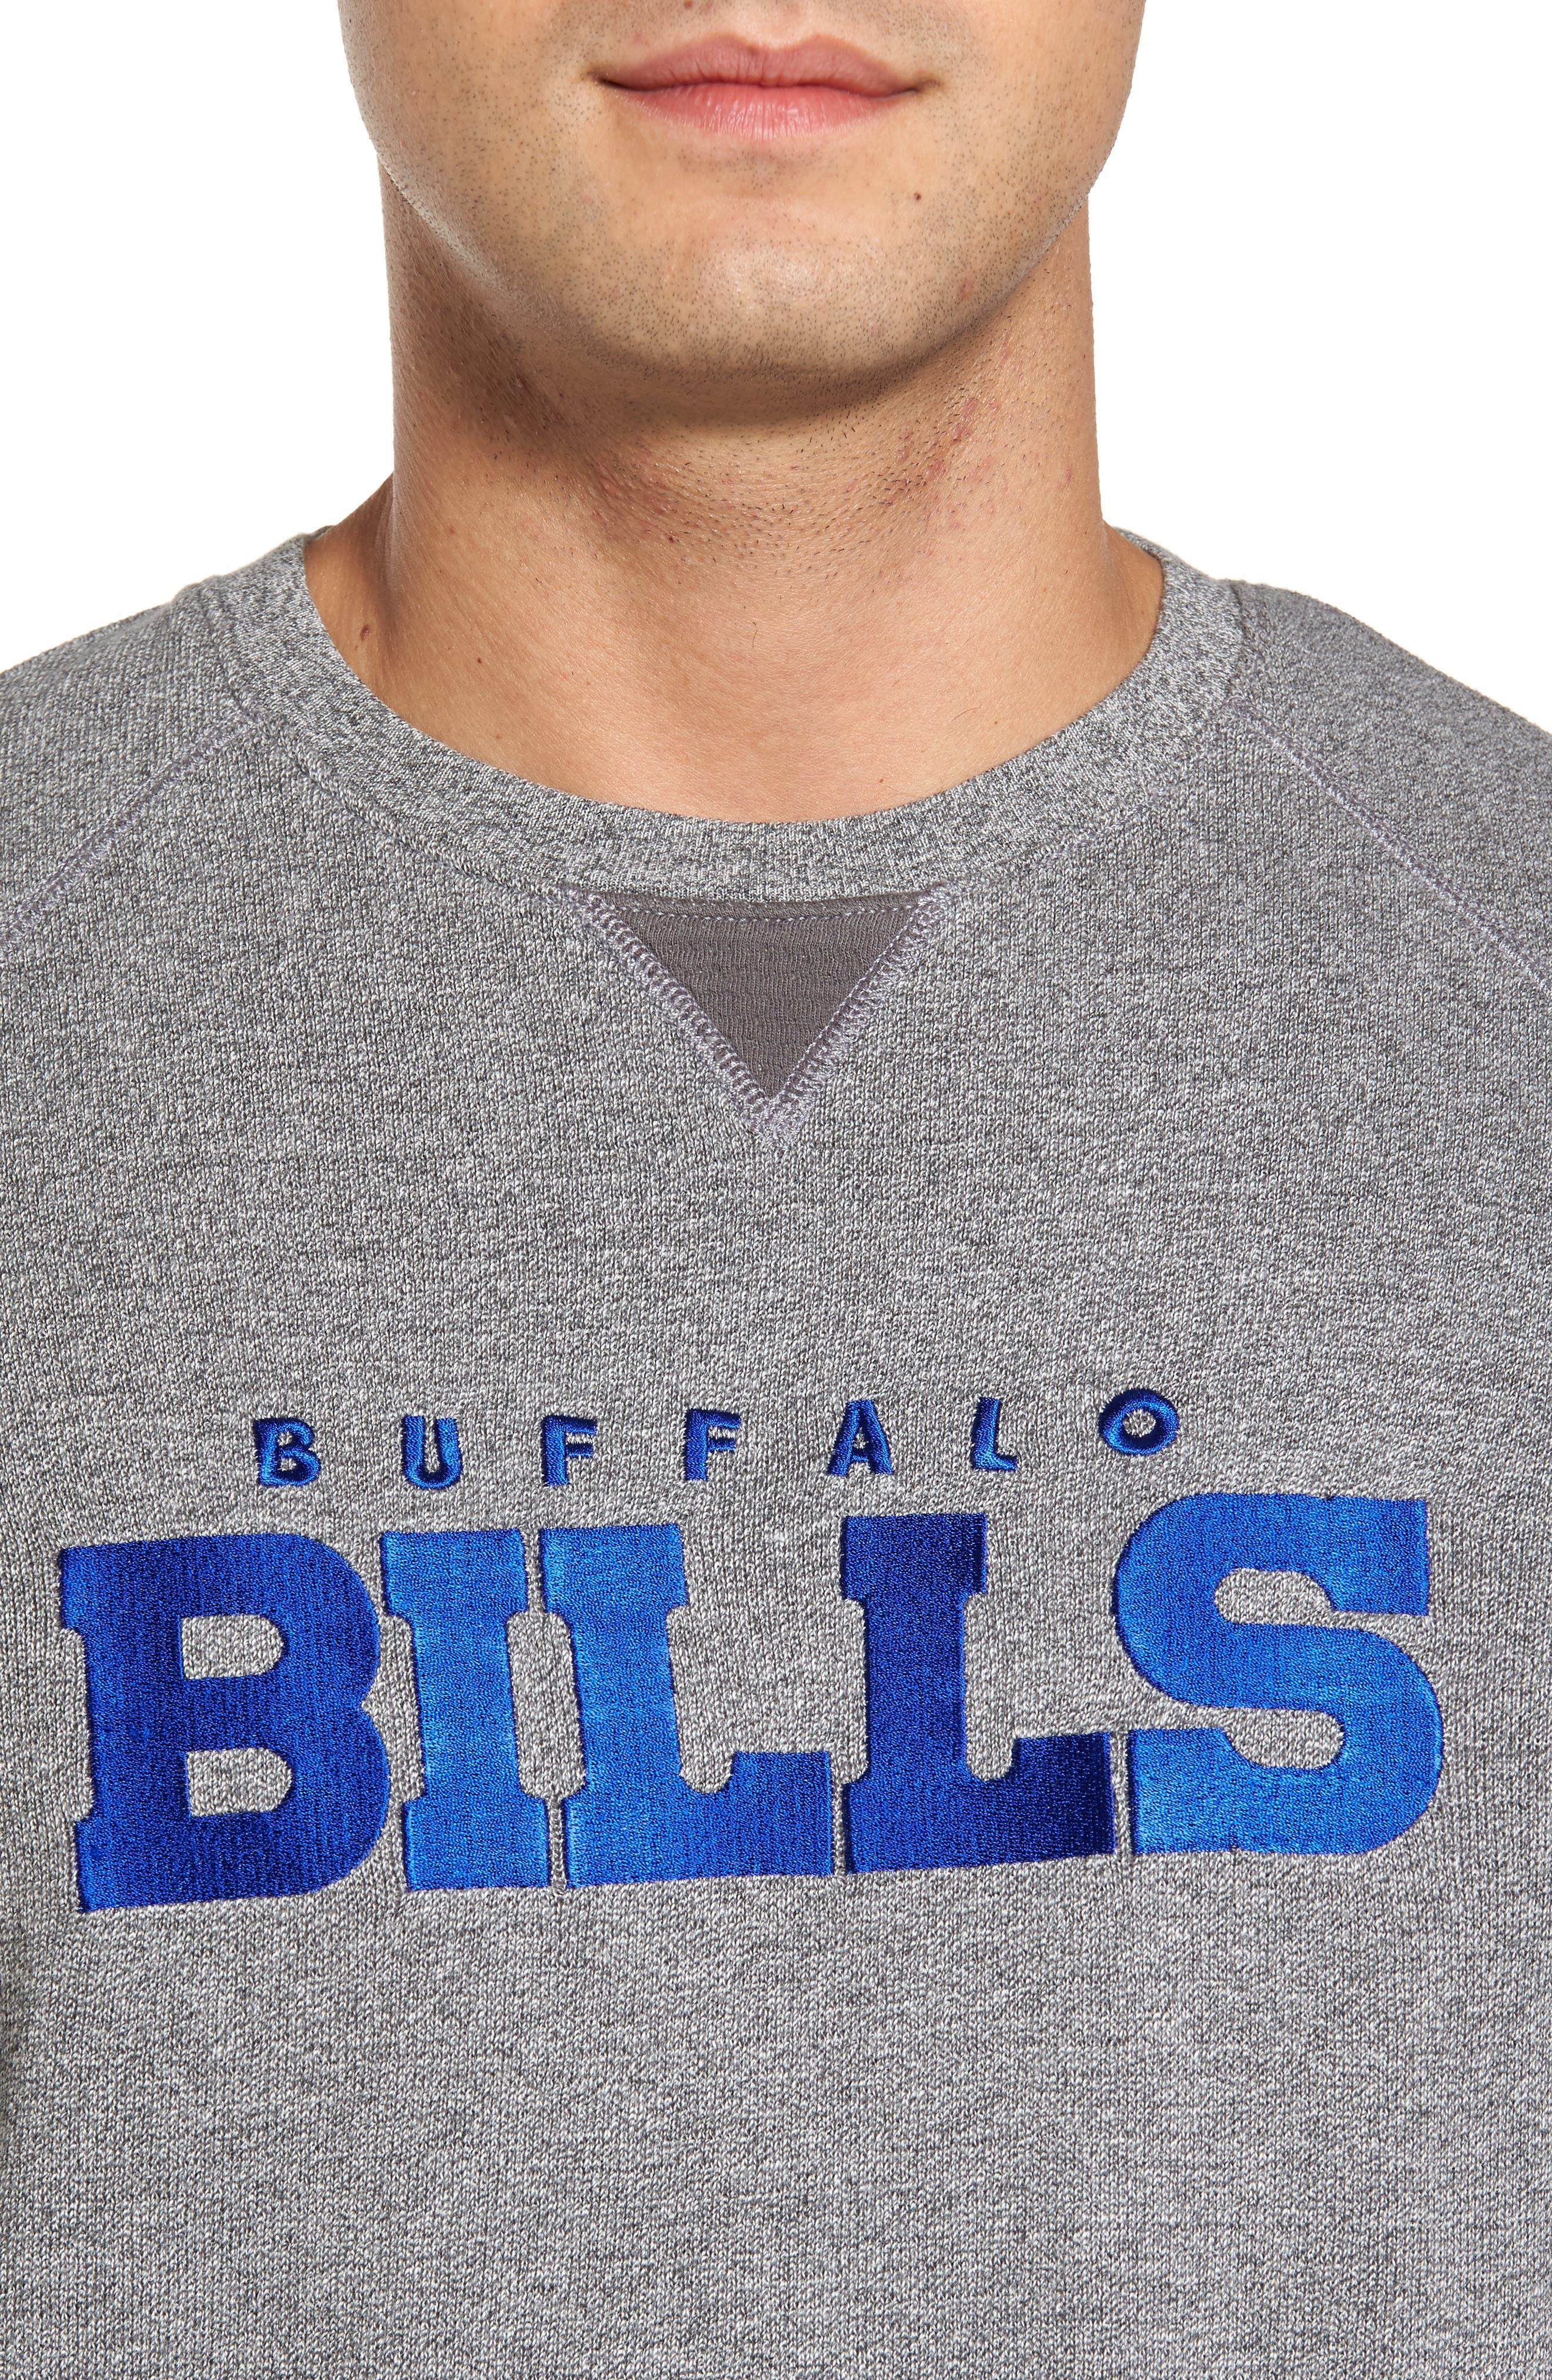 NFL Stitch of Liberty Embroidered Crewneck Sweatshirt,                             Alternate thumbnail 97, color,